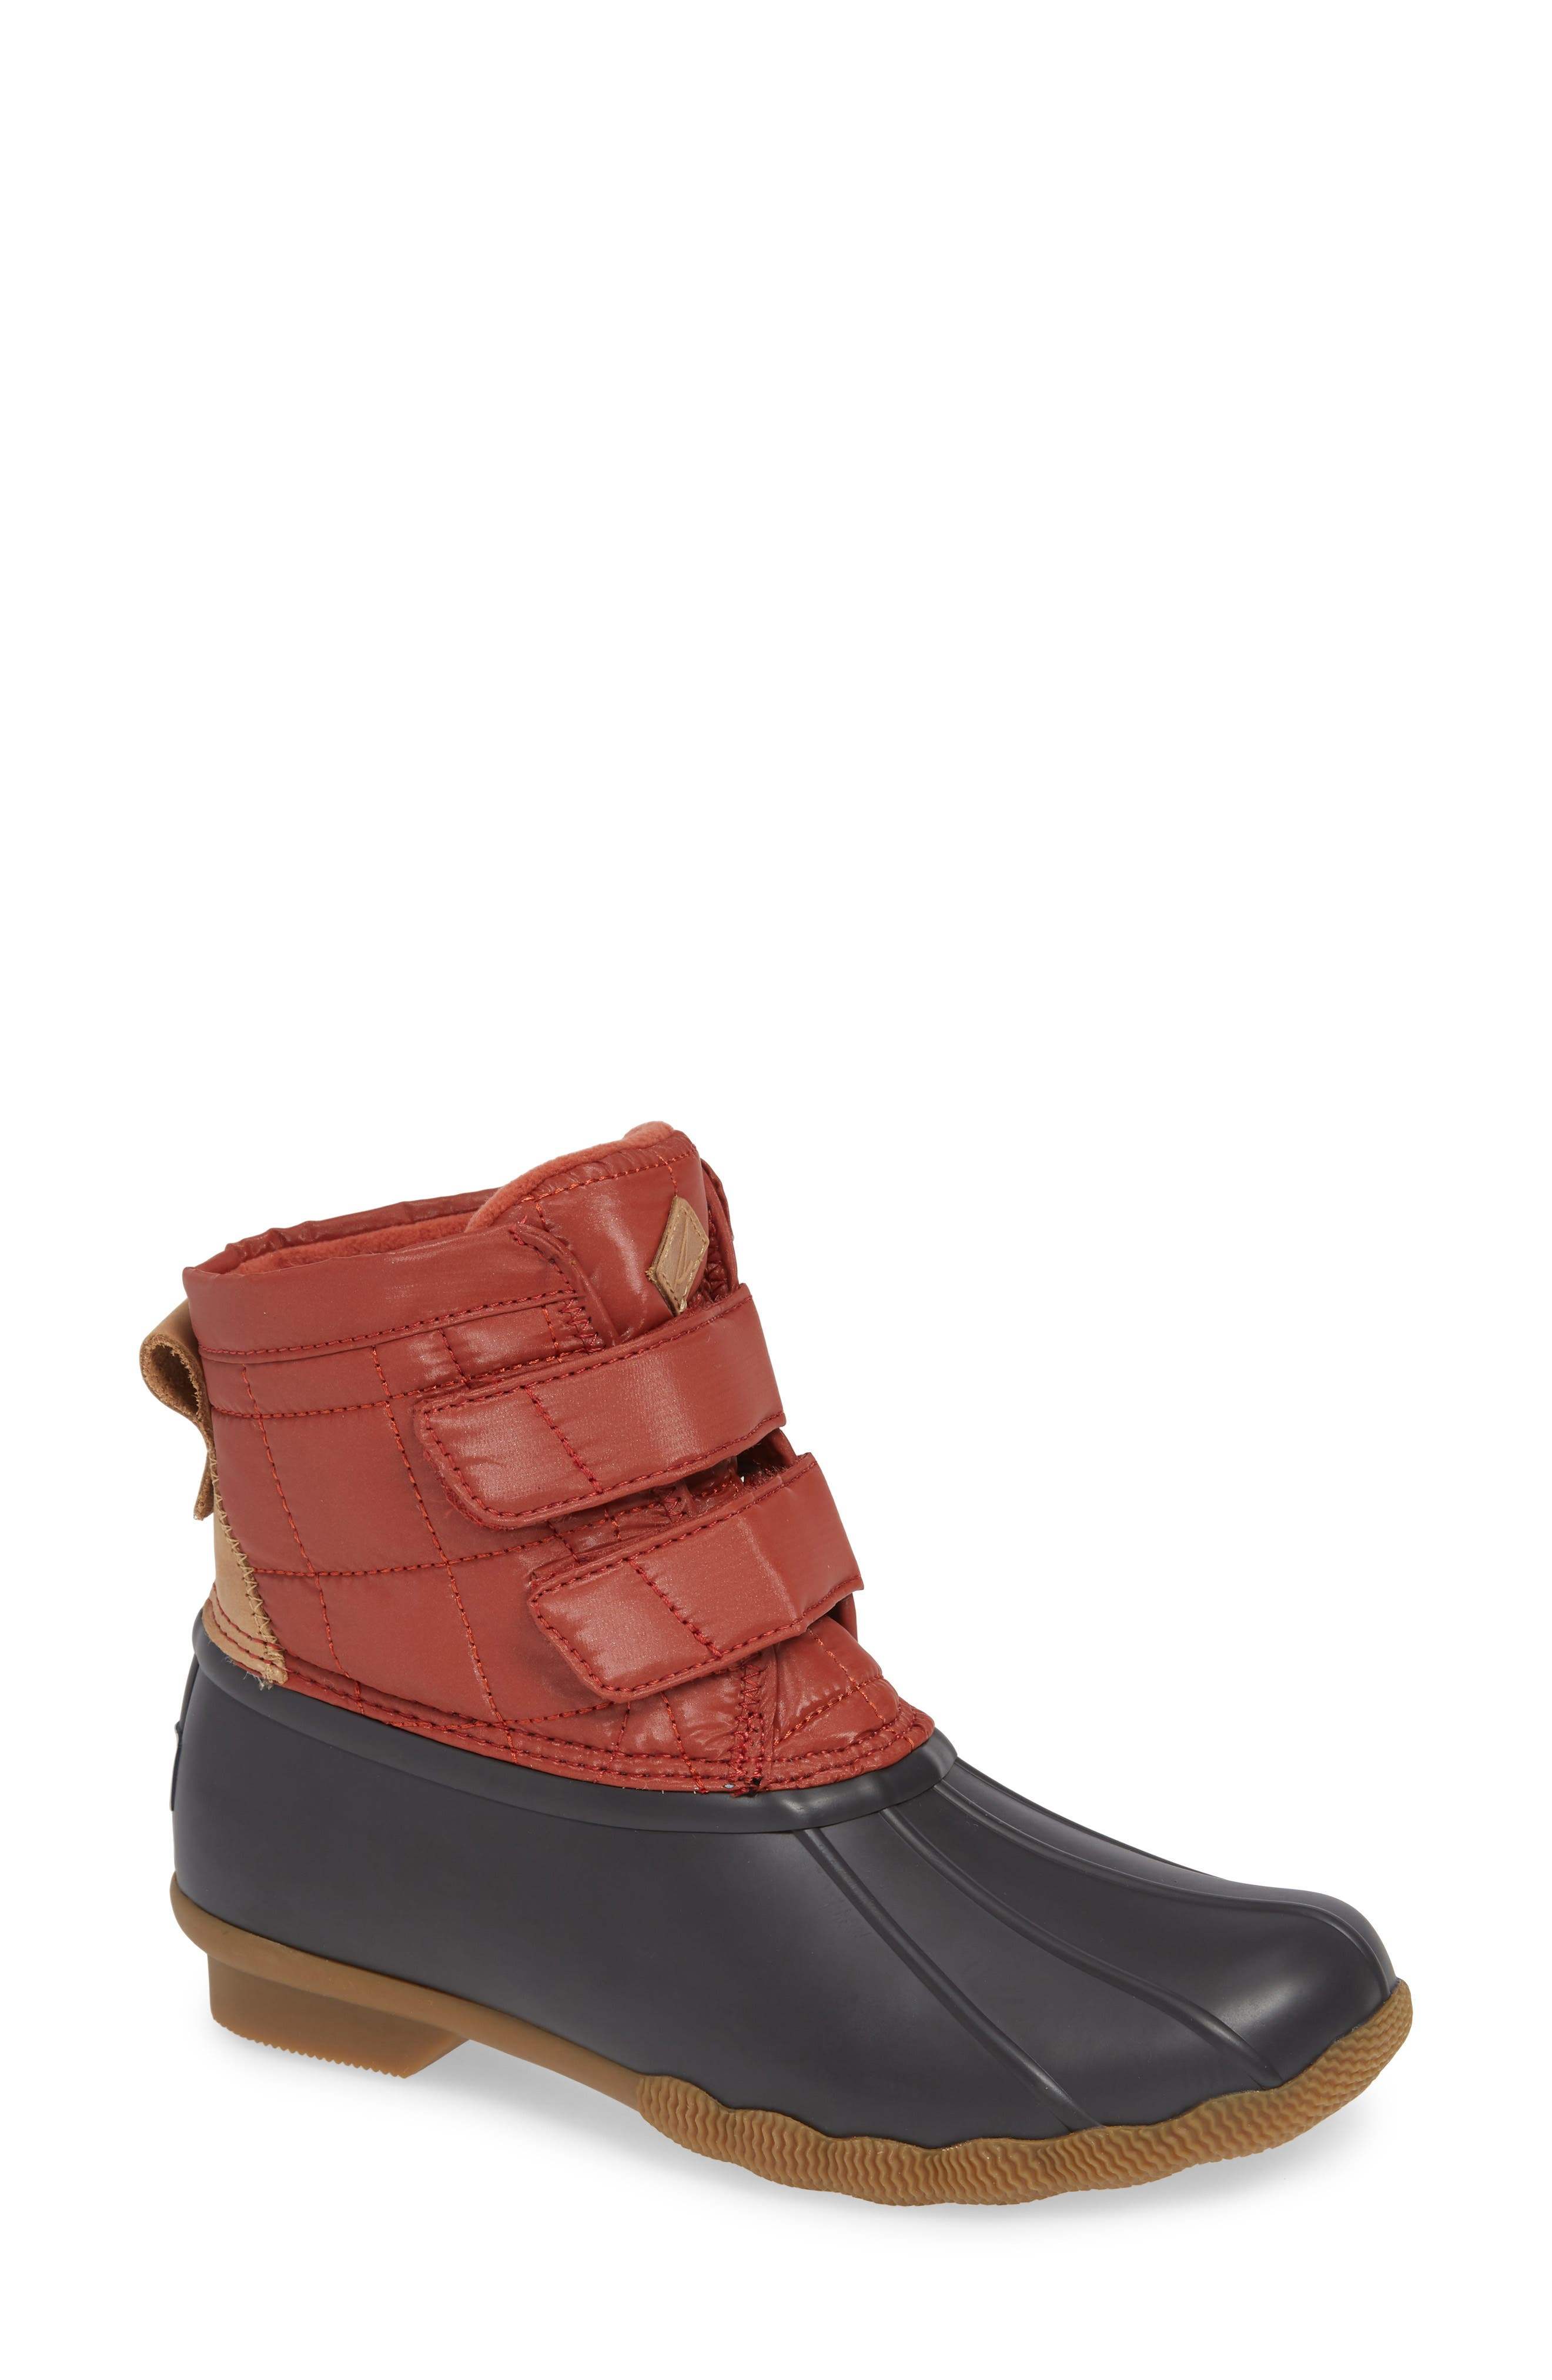 Saltwater Jetty Rain Boot,                         Main,                         color, 600